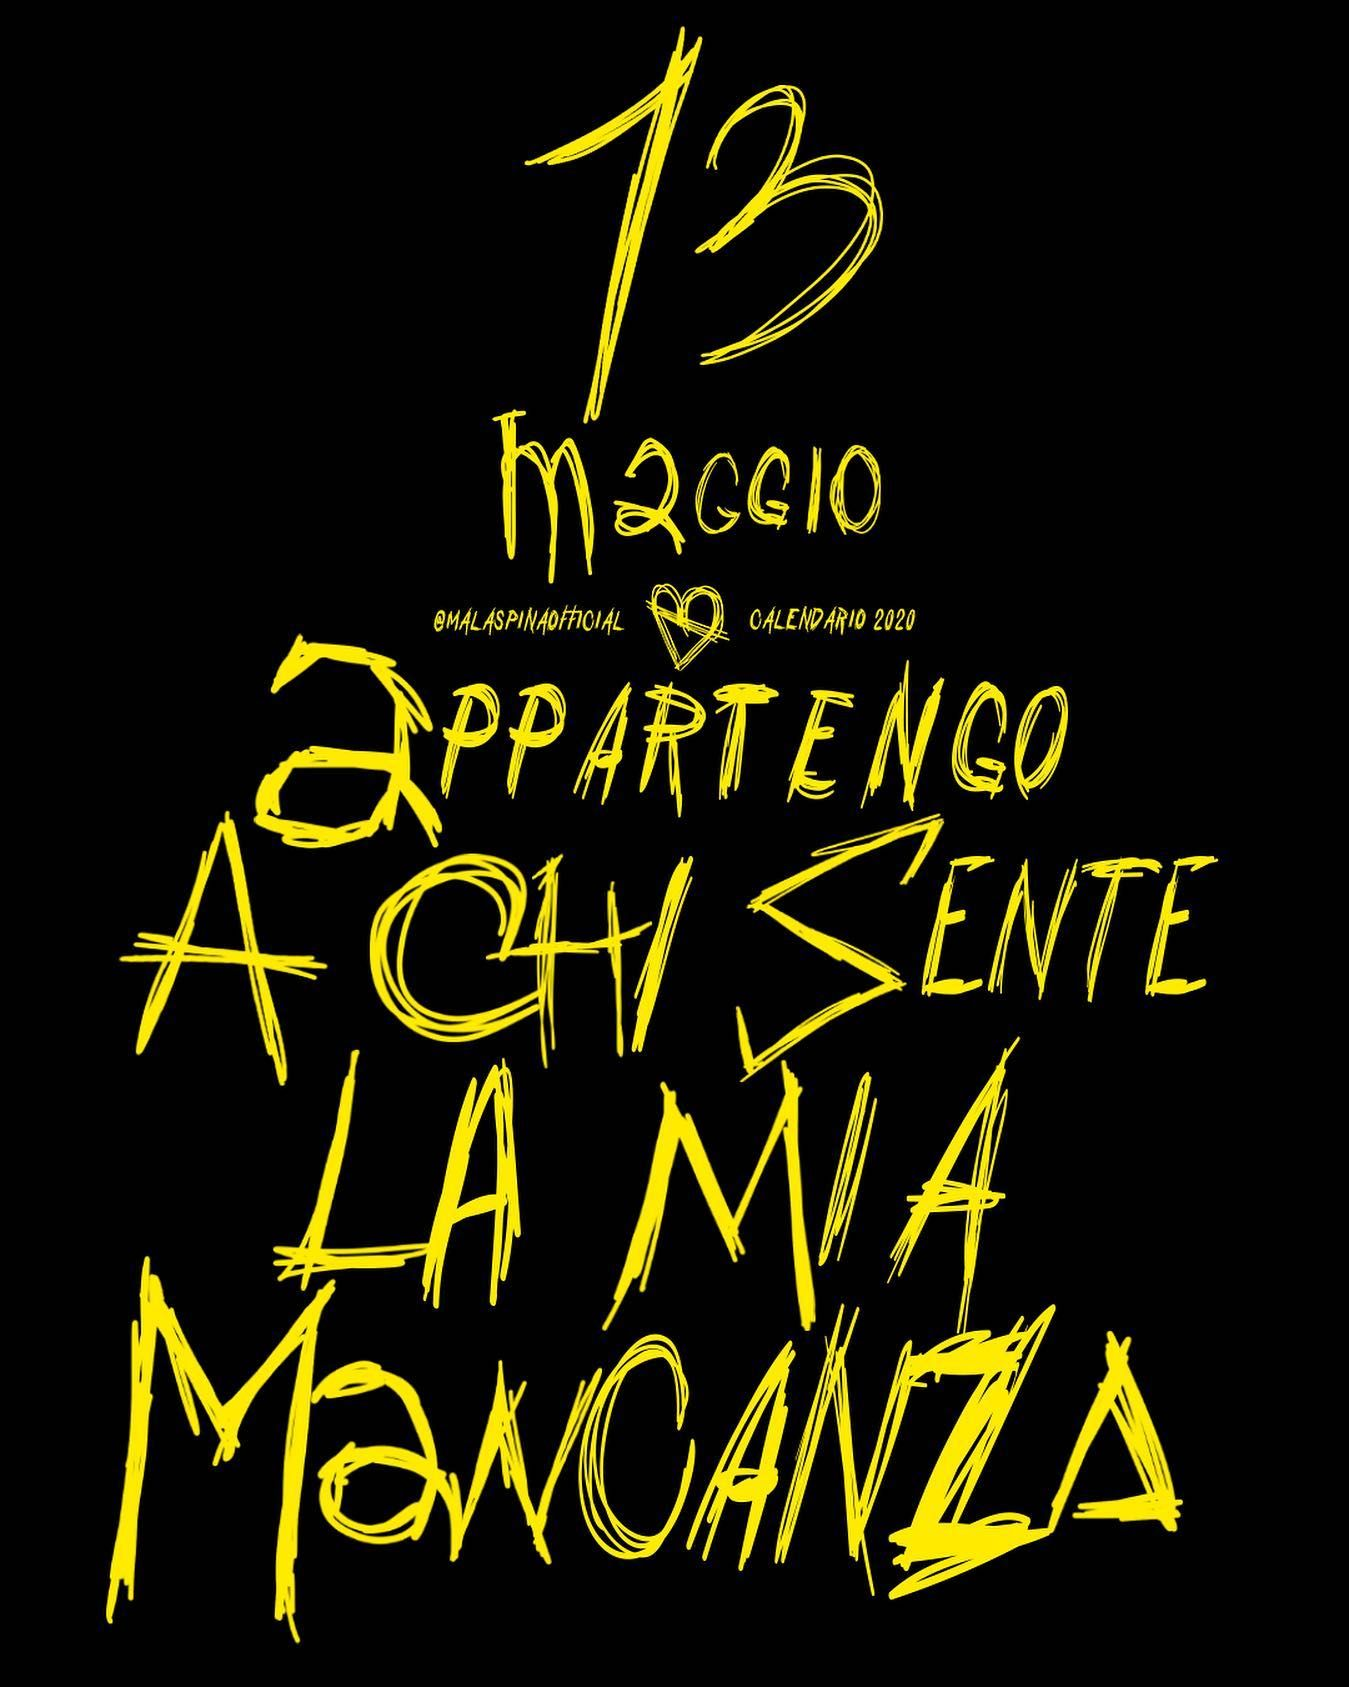 // 🤷🏻♀️ CONDIVIDI NELLE STORIE SE LA PENSI COSÌ #malaspina #malaspinaofficial #essere #frasibellissime #citazioni #frasilibri #aforismi #pensieri #frasidamore #aesthetic #frasi #frasitop #frasibelle #frasitumblr #frasivere #frasiitaliane #frasisignificative #felicità #pensiero #vita #amore #tiamo #tumblrgirl #tumblr #frasiitaliane #mimanchi #amicizia #netflix